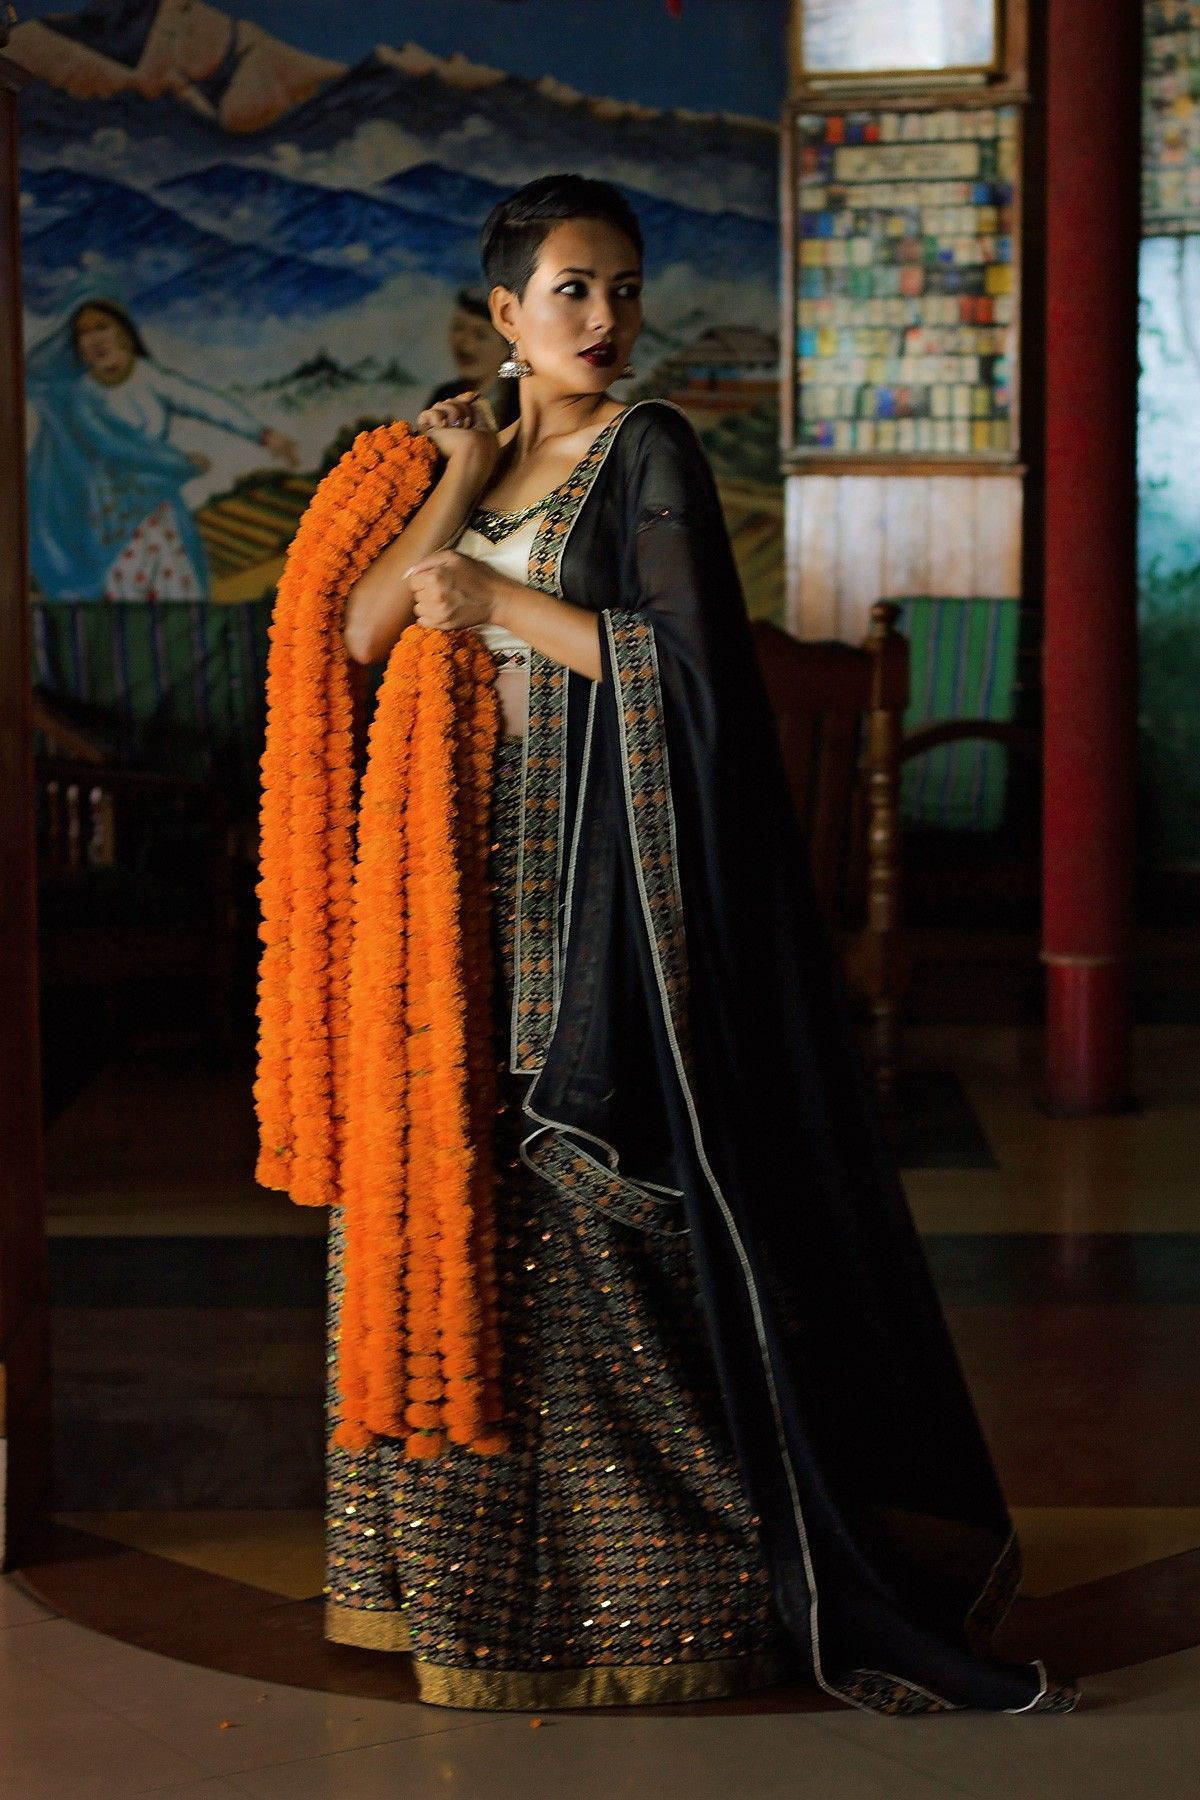 e3ae3b85b5fdd6 Nepali Dhaka Saree | Asian Fashion in 2019 | Fashion, Saree, Asian ...